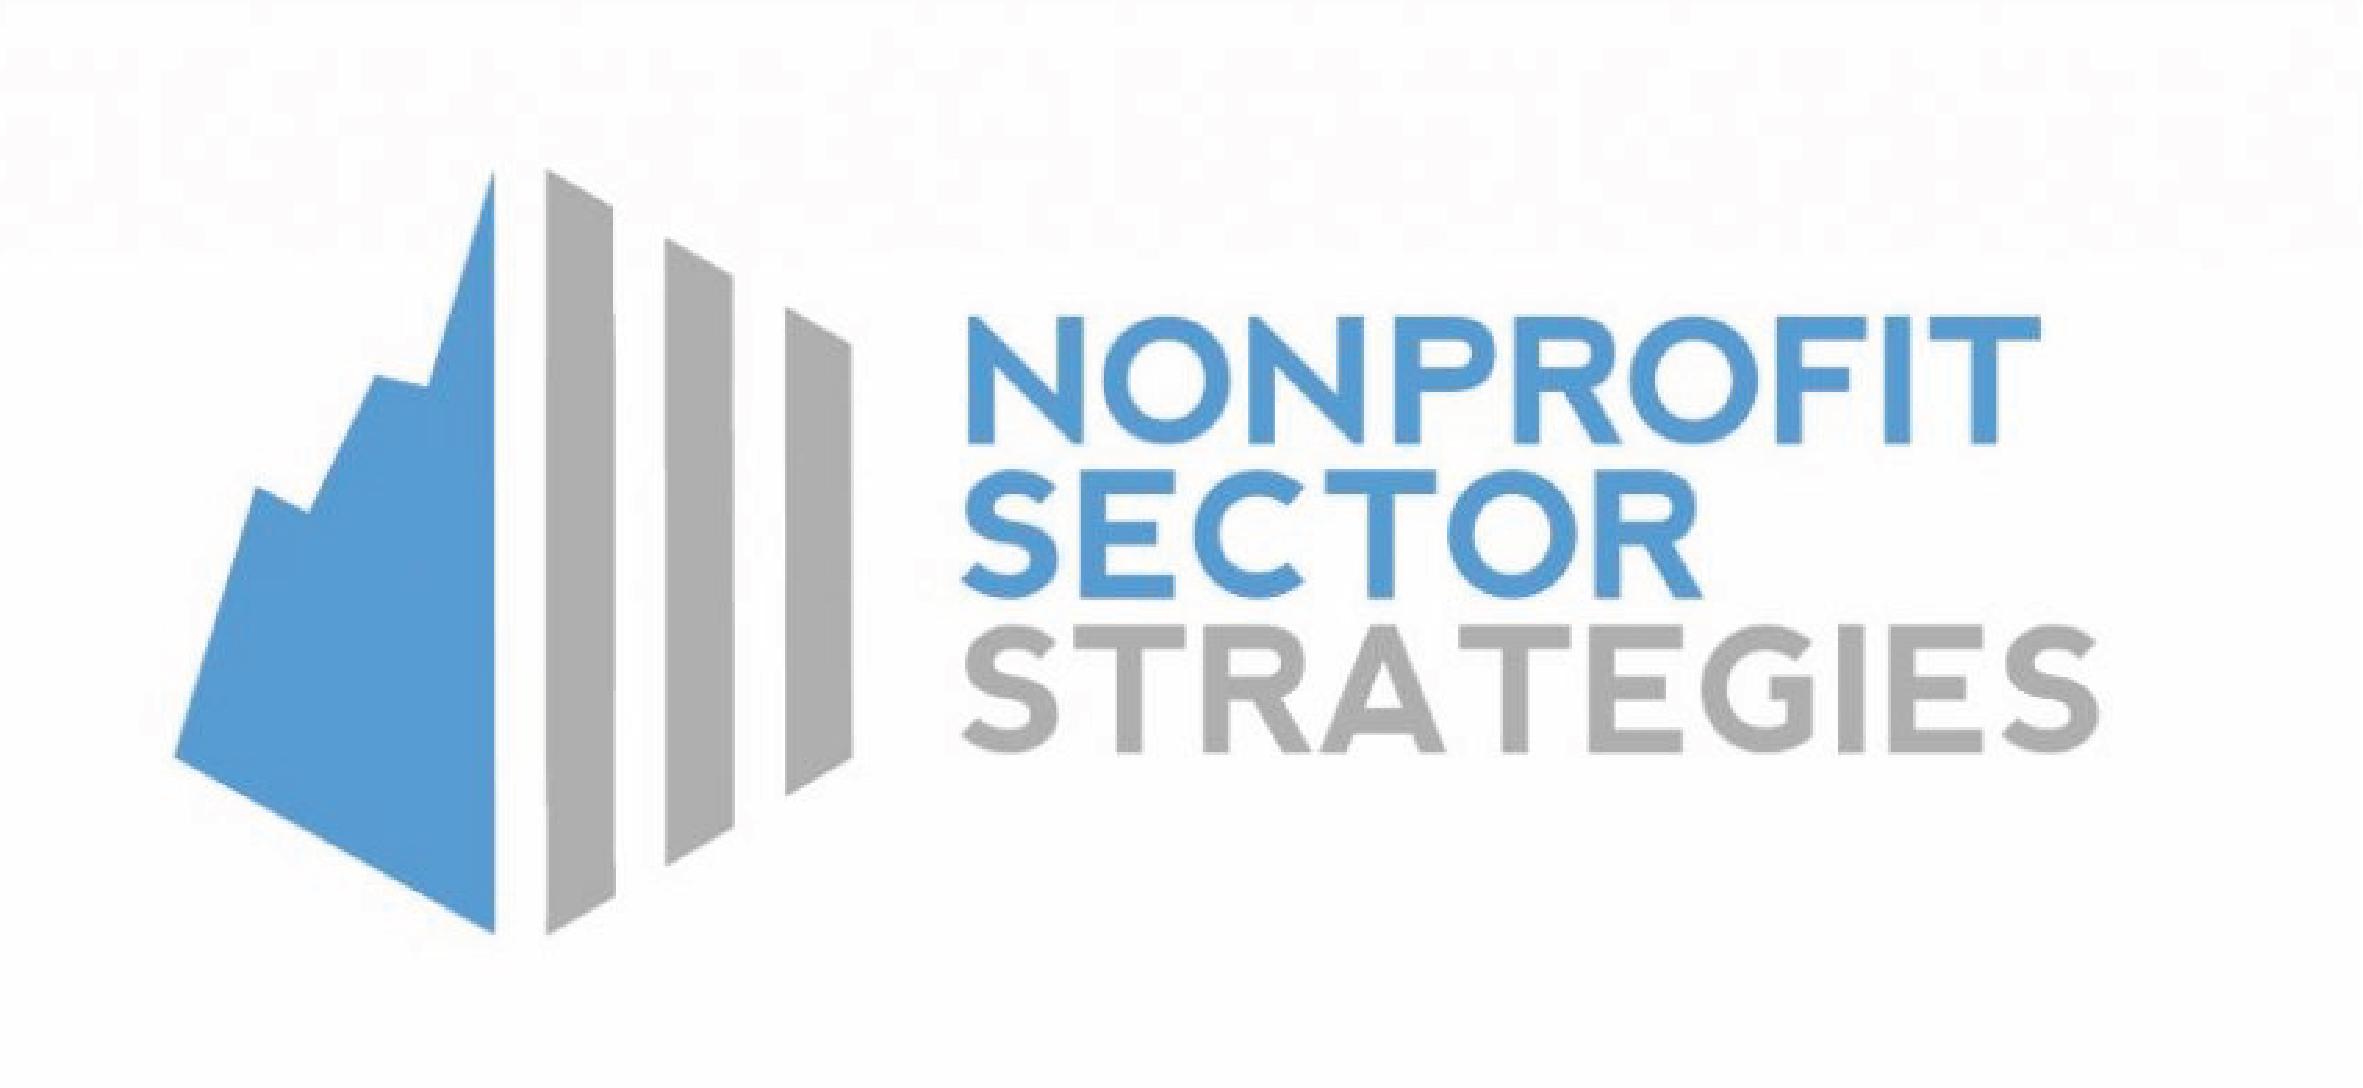 nonprofit sector strategies logo